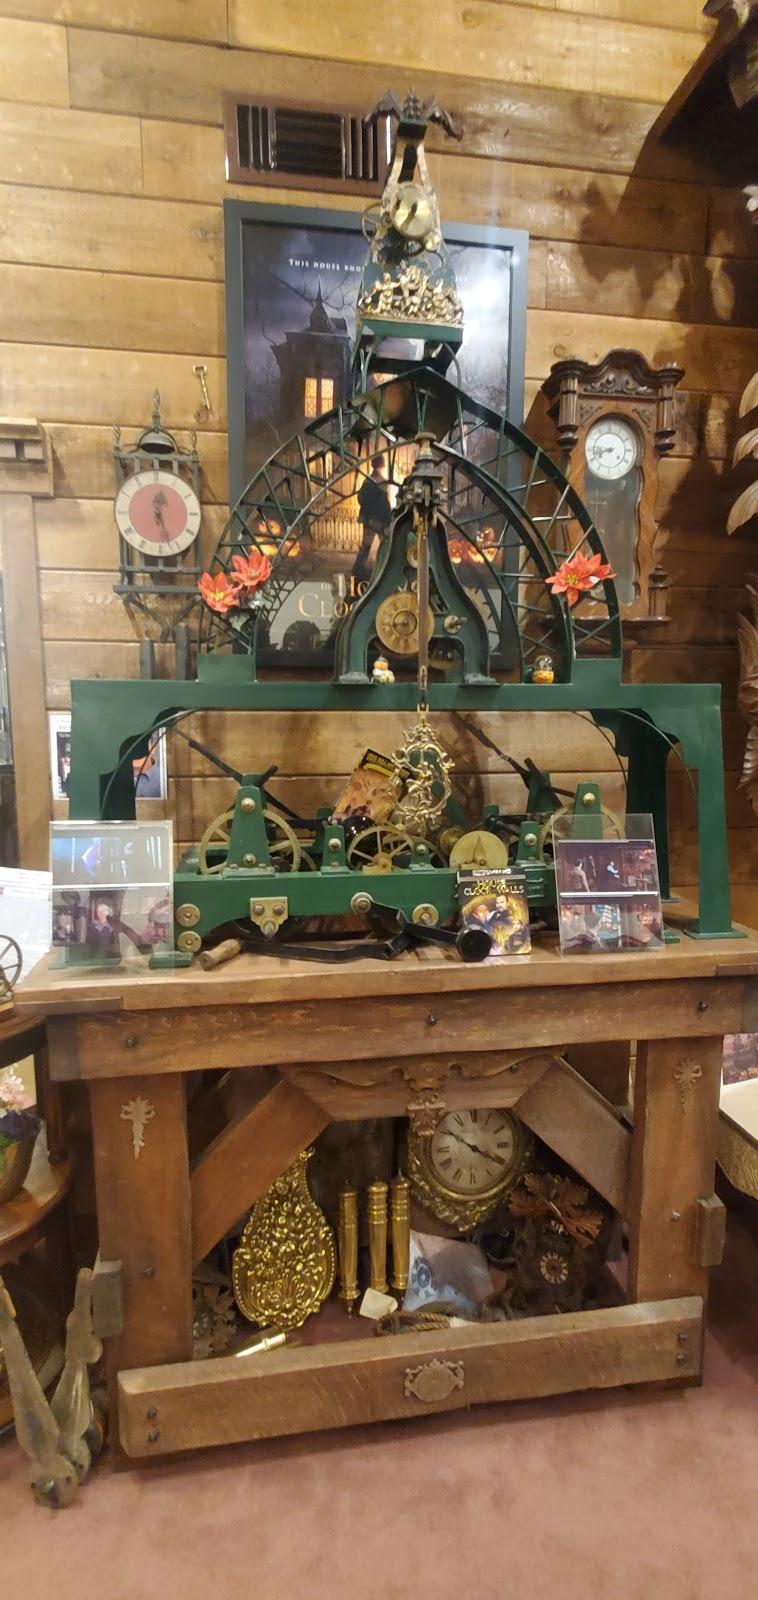 Champs Clock Shop - museum    Photo 4 of 10   Address: 3834 King Dr, Douglasville, GA 30135, USA   Phone: (770) 942-2128